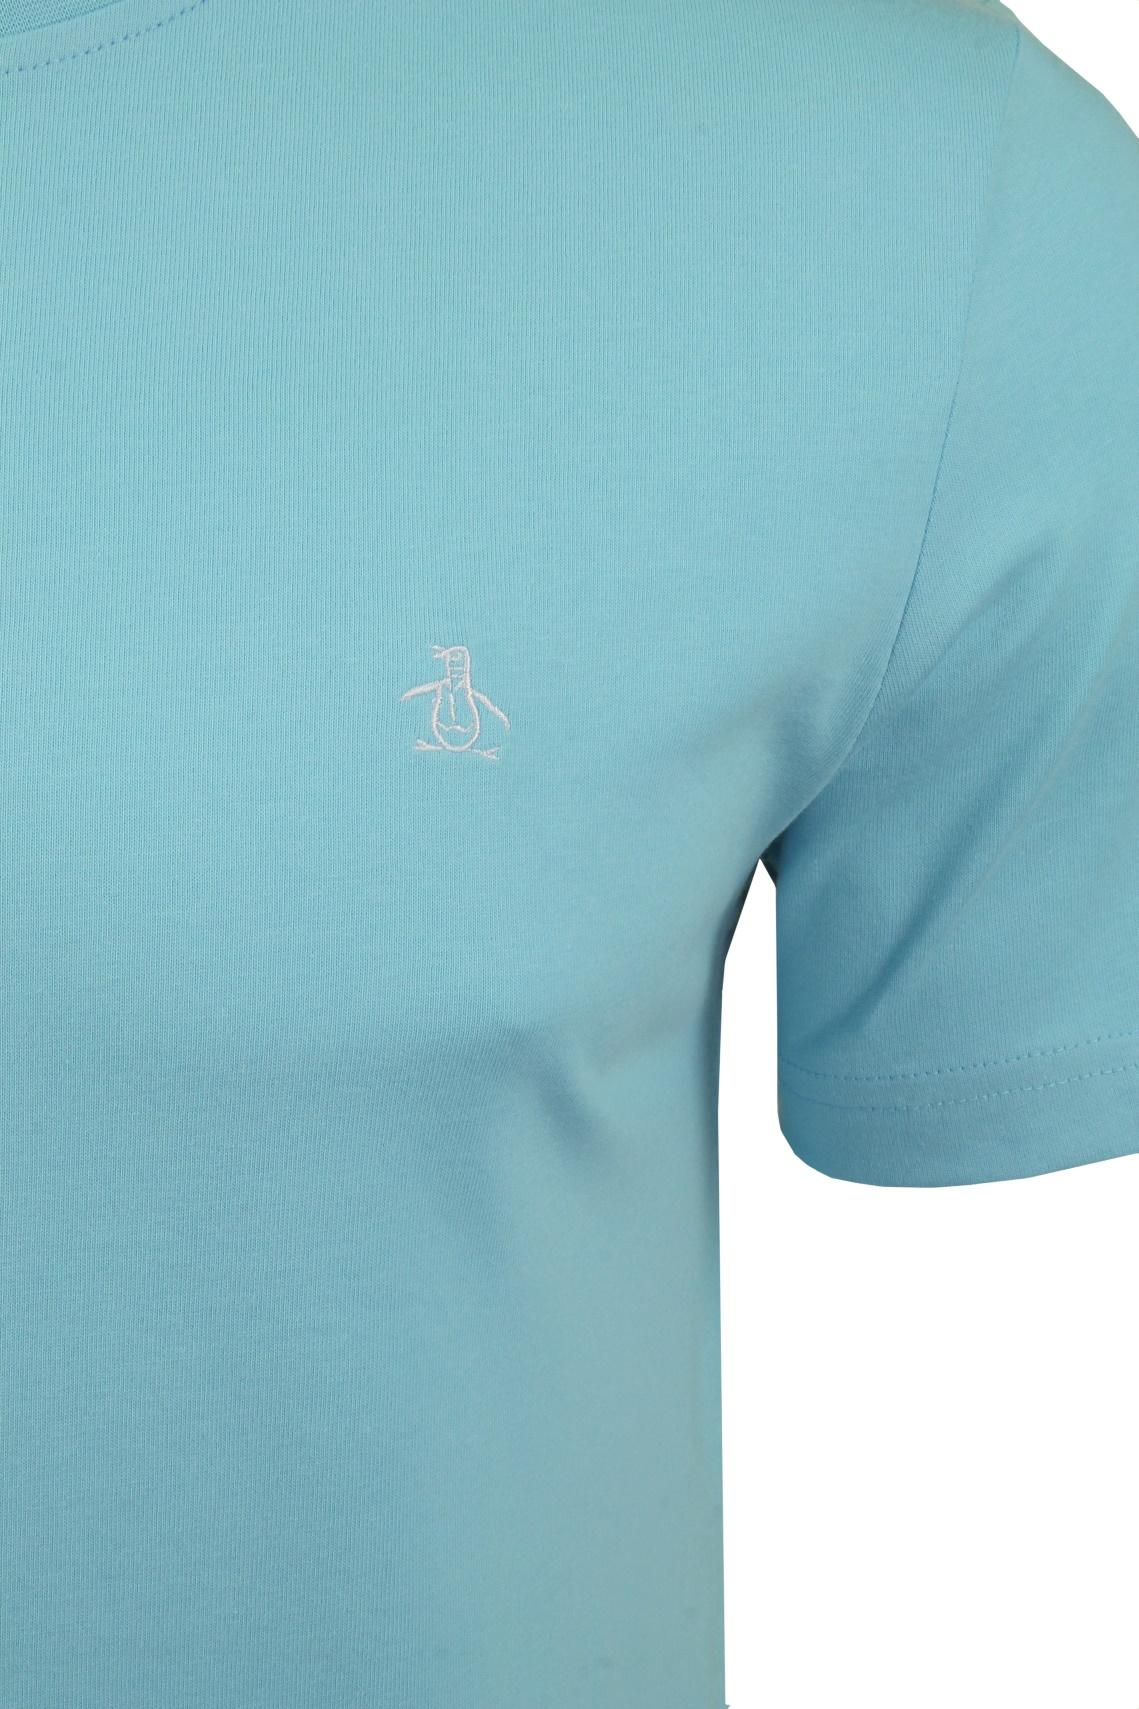 Mens-T-Shirt-by-Original-Penguin-Crew-Neck-Short-Sleeved thumbnail 7